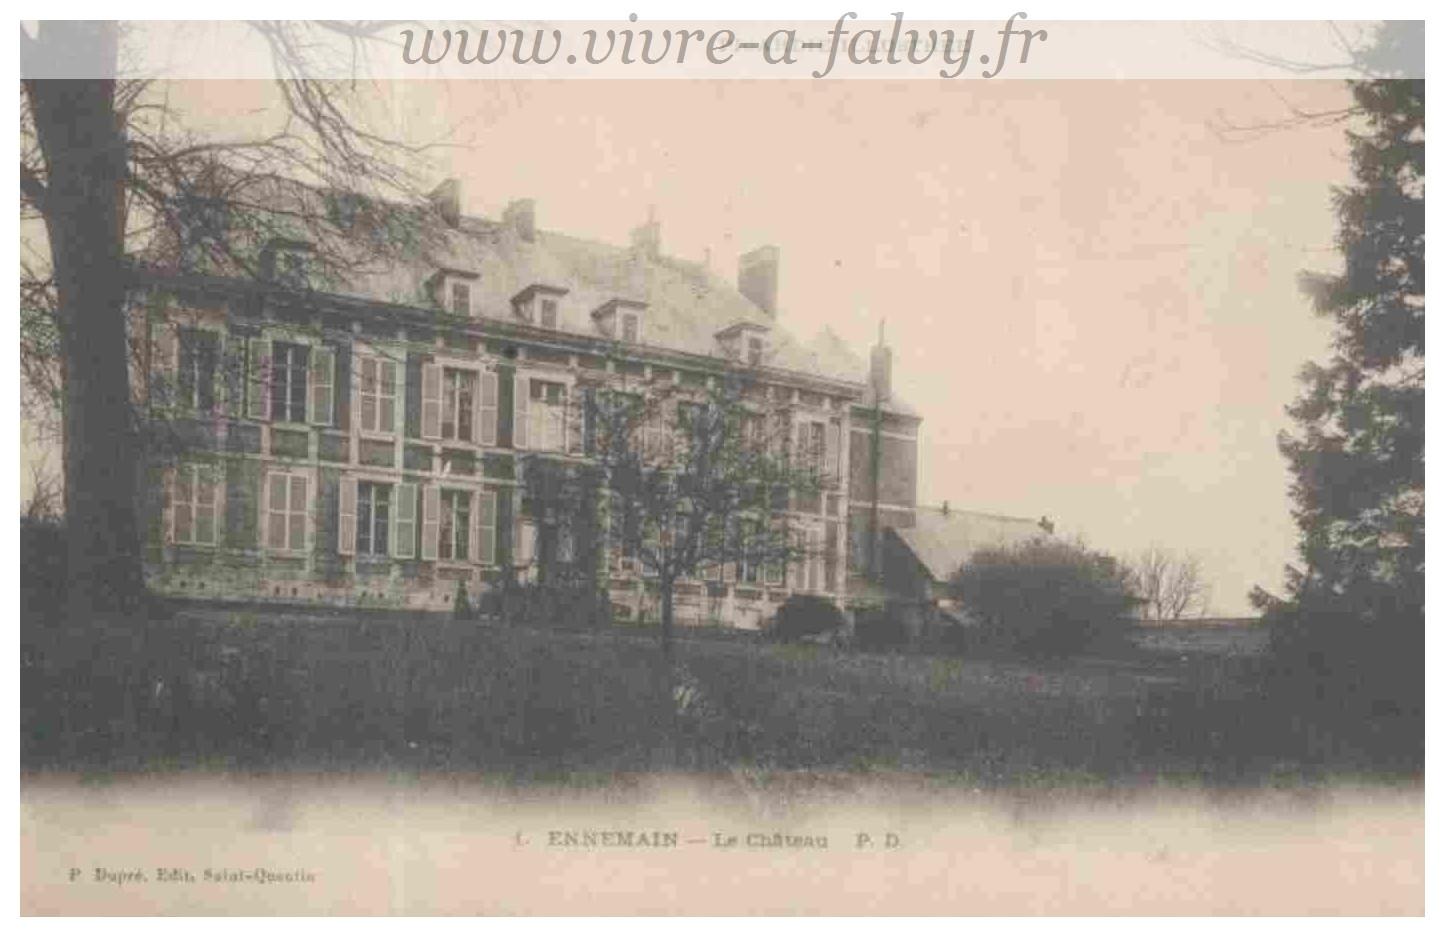 Ennemain - Le Château